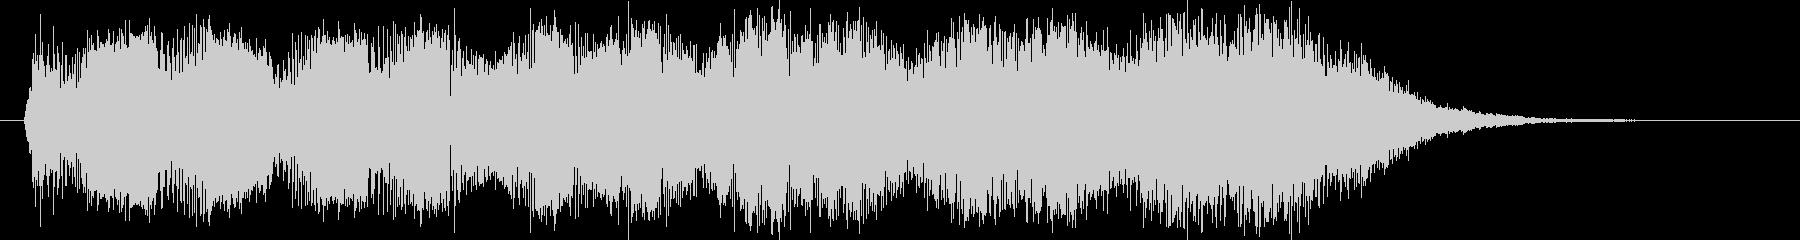 EDM系のDJ/音楽制作用フレーズ!02の未再生の波形